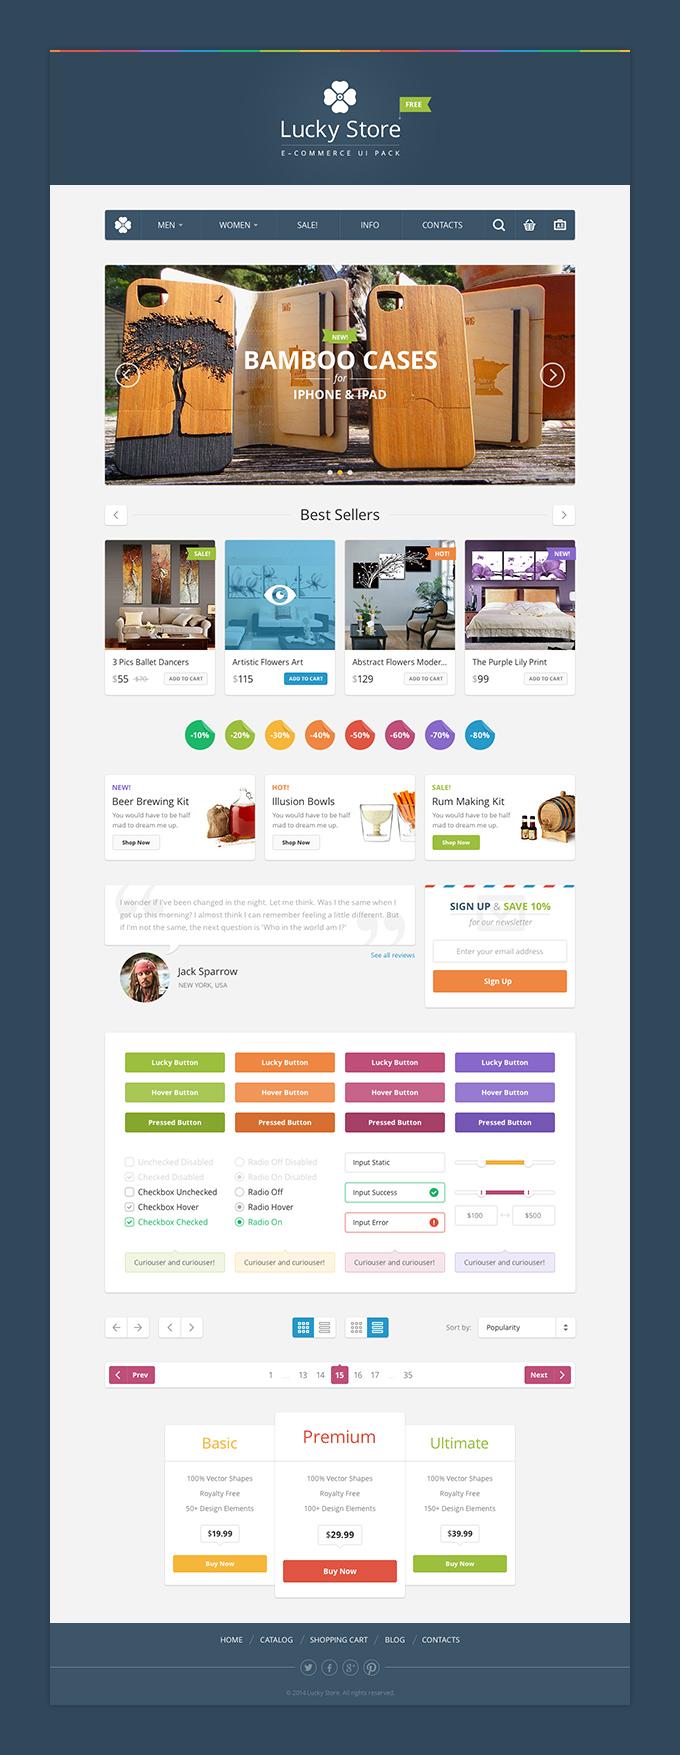 Lucky Store UI Free Photoshop Web UI Kits